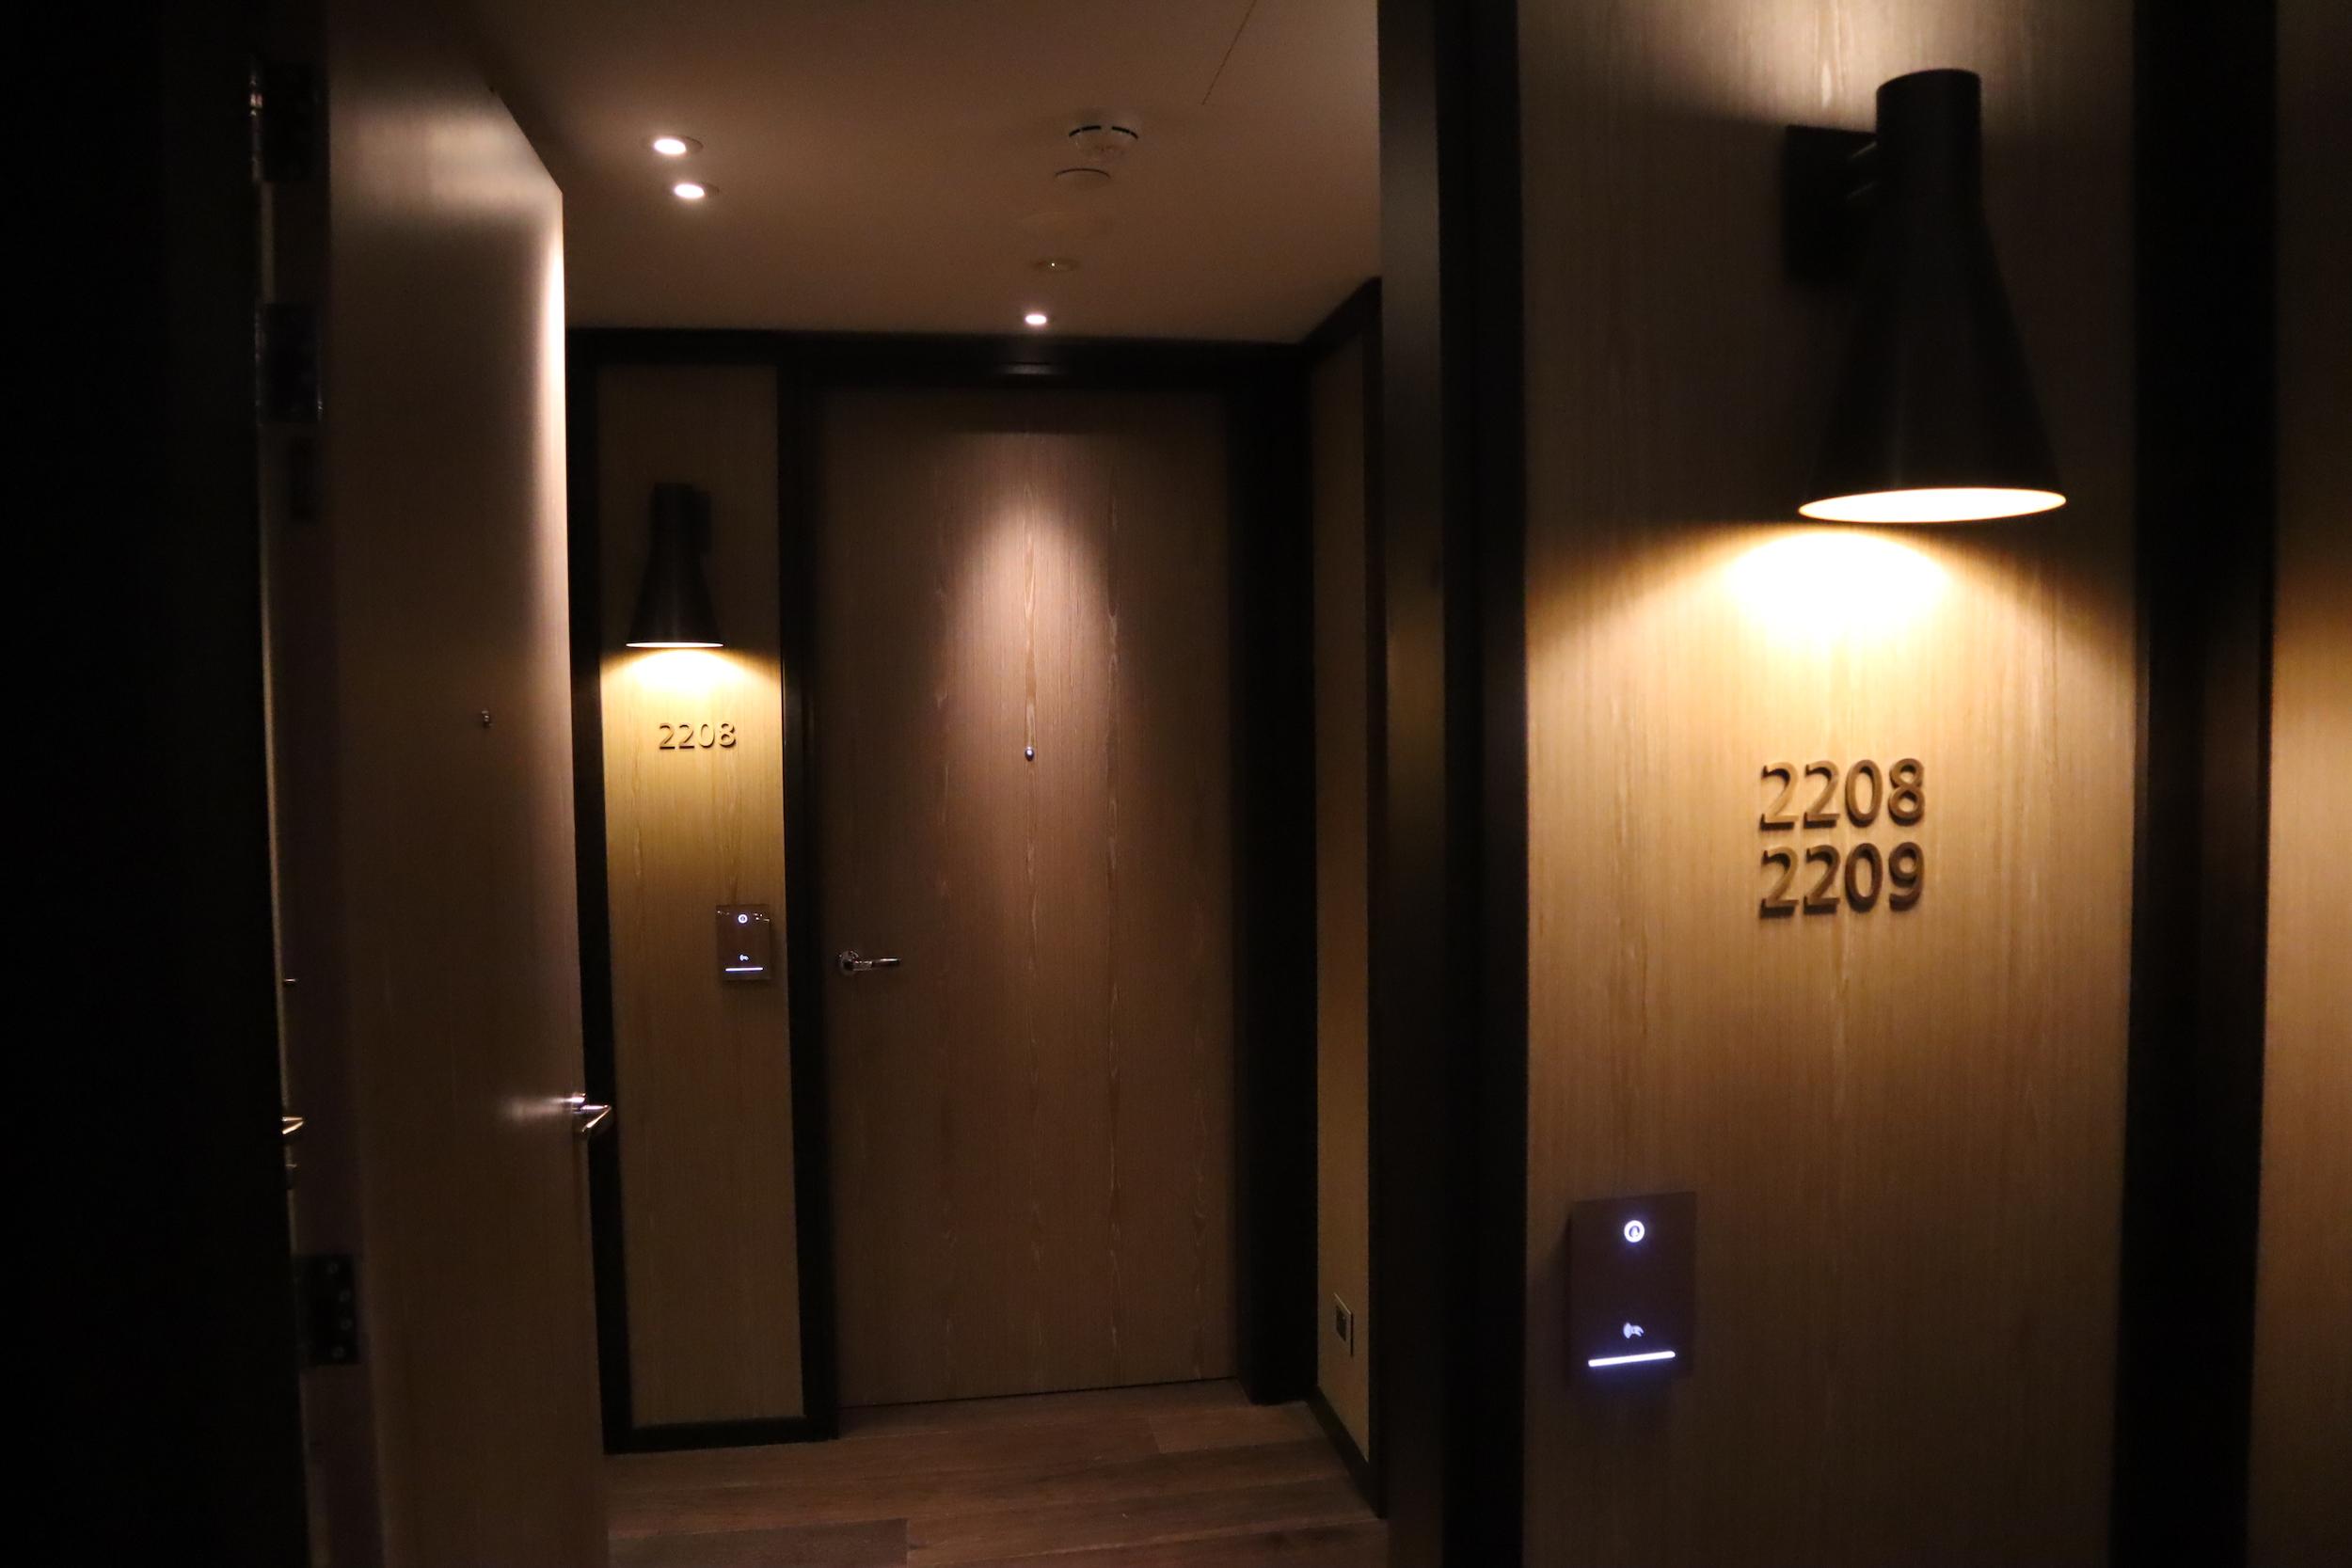 Westin Perth – Room 2208